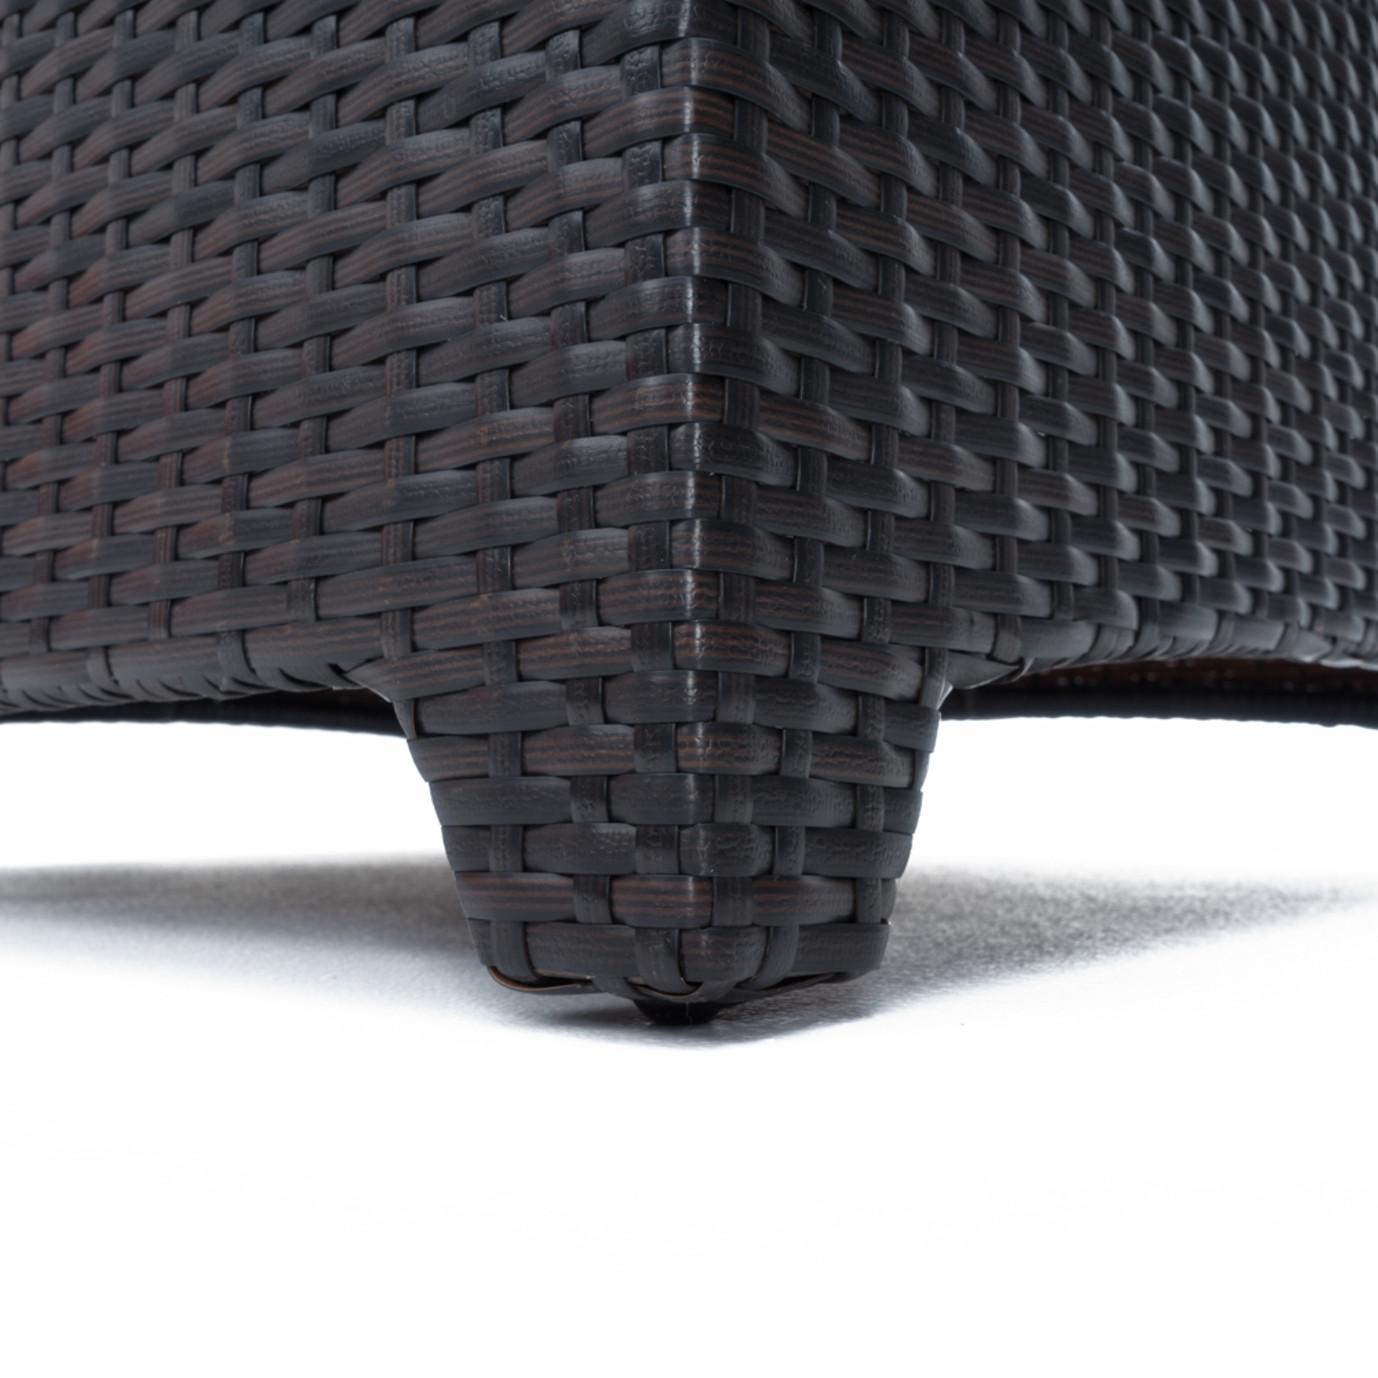 Deco™ Club Chairs and Side Table - Tikka Orange